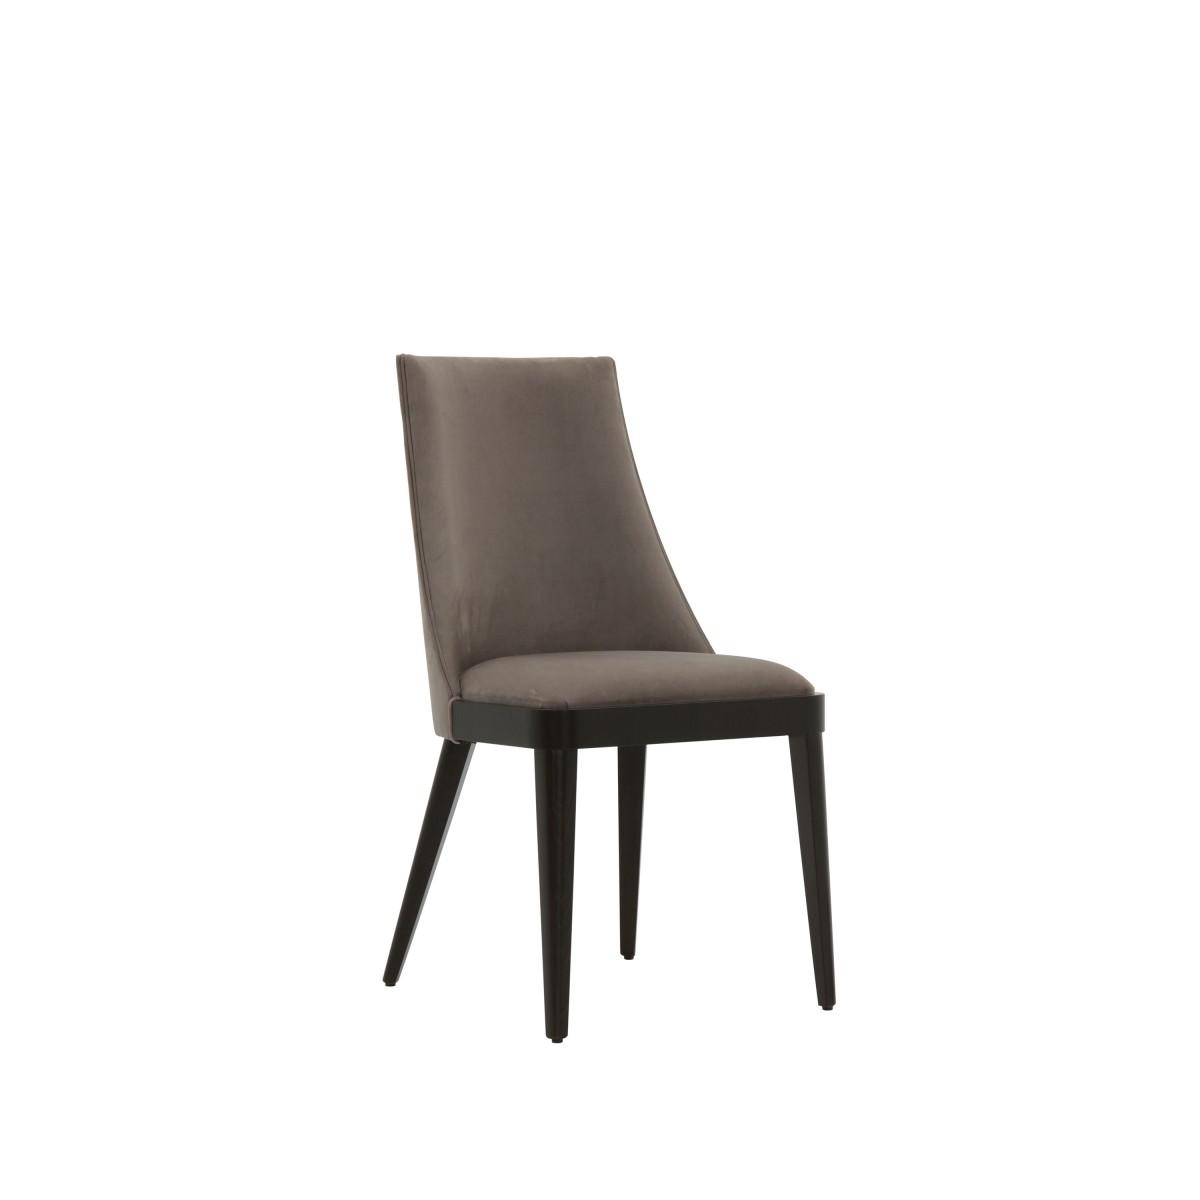 5177 modern style wood chair norvegia2